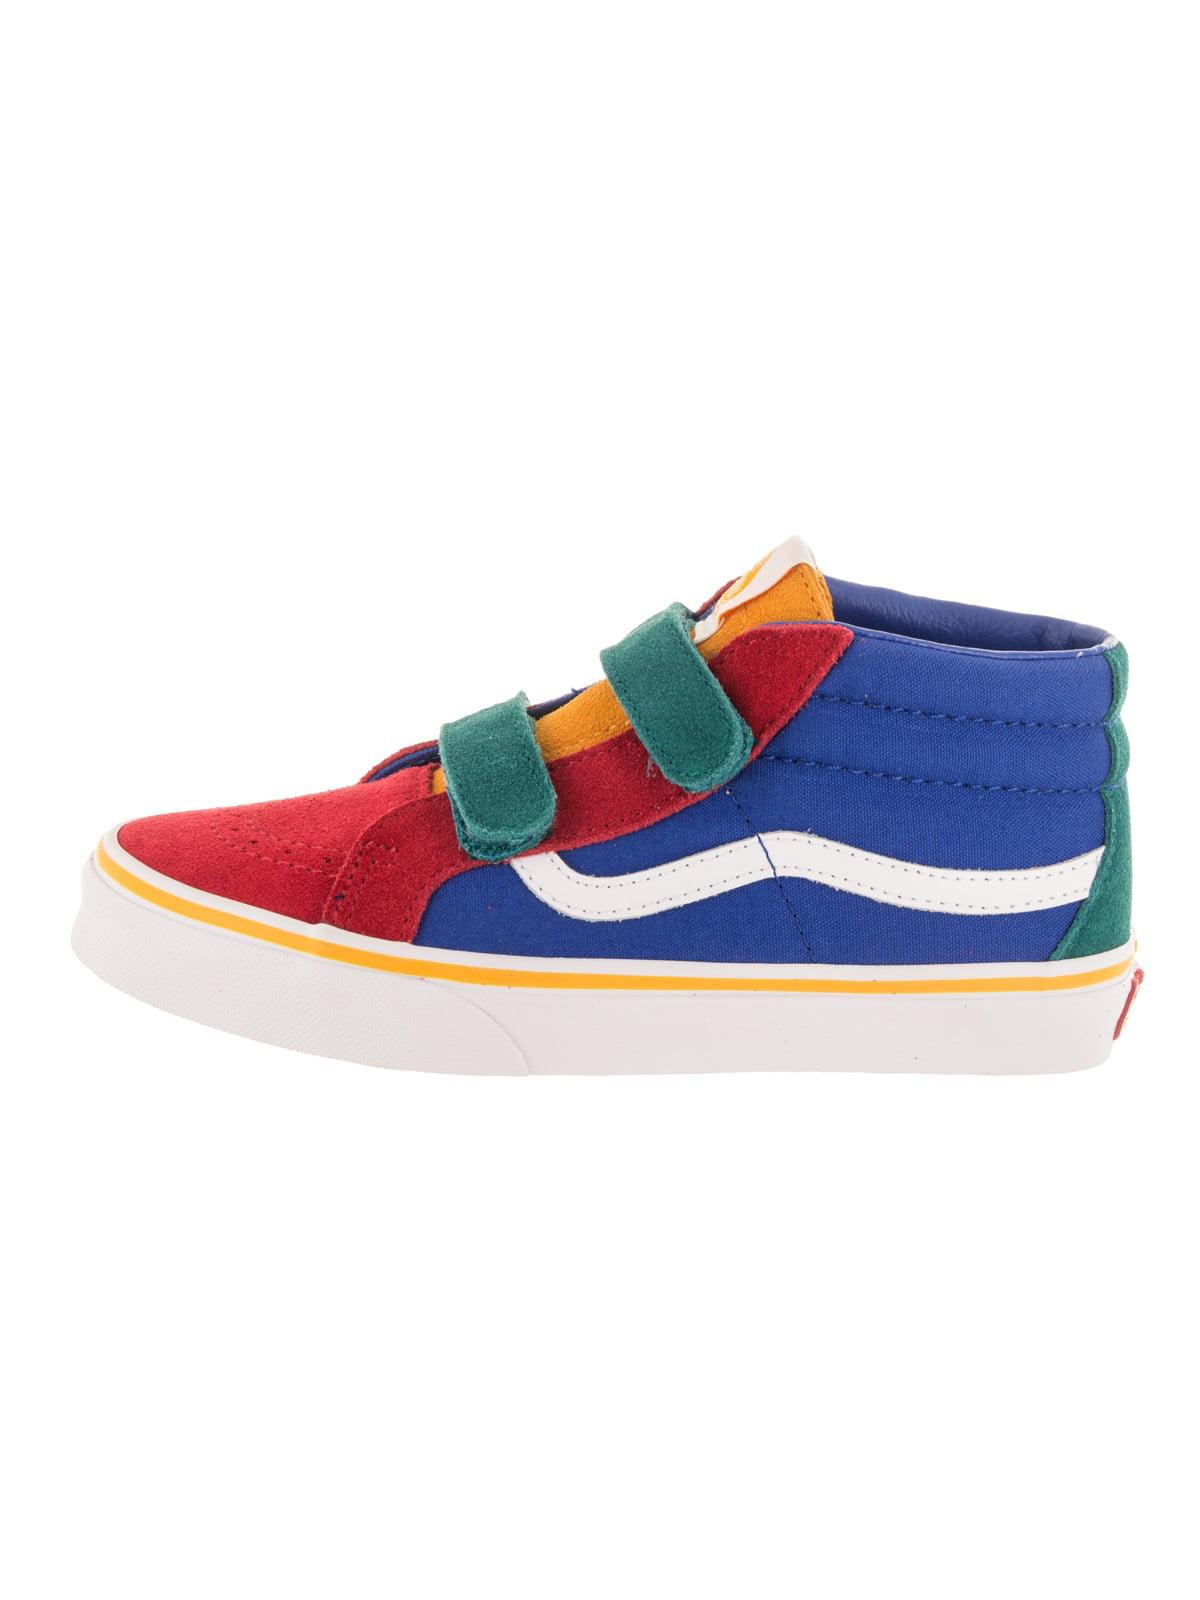 Vans - Vans Kids Sk8-Mid Reissue V (Primary Block) Skate Shoe - Walmart.com 5b9479a2b